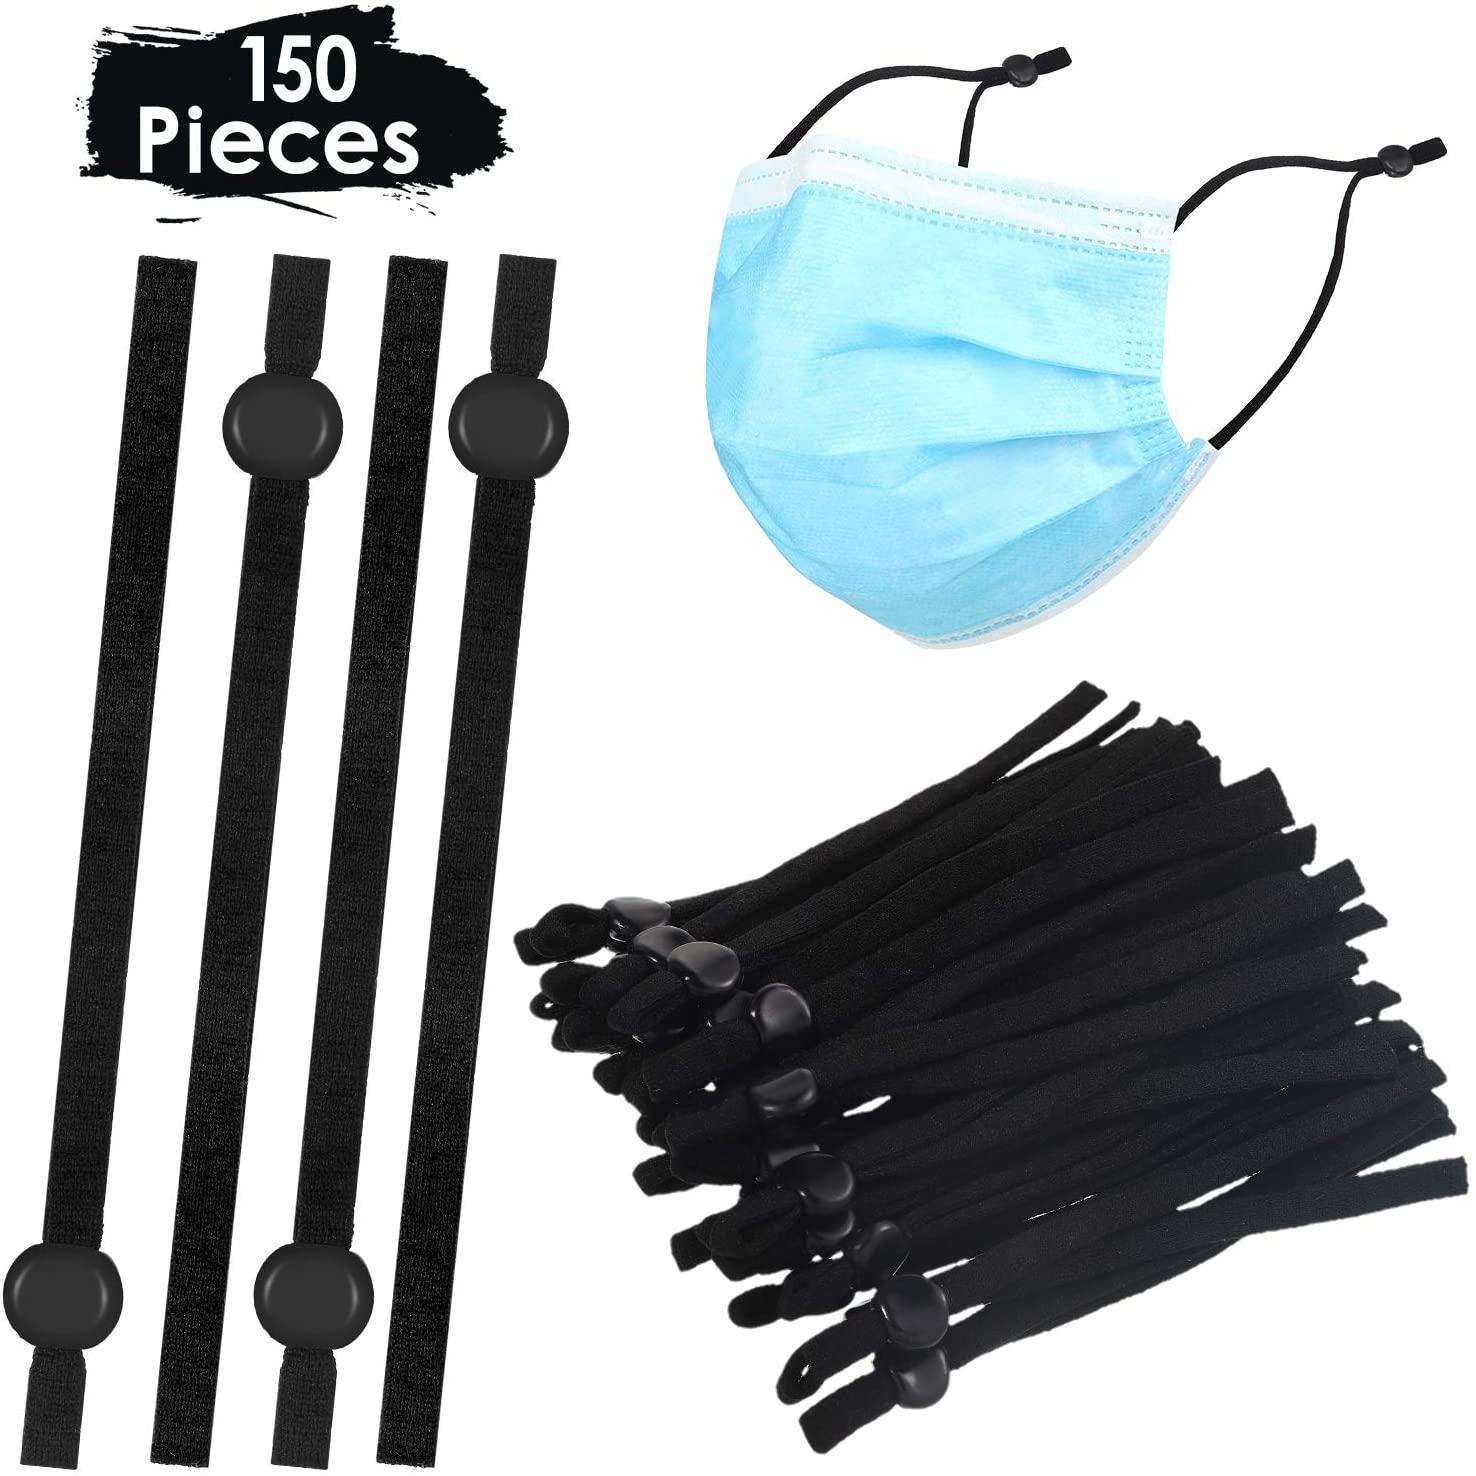 150 Pieces Sewing Elastic Band Cord with Adjustable Buckle Stretchy Earloop Adjustable Ear Spool Straps Anti-Slip Ear Loop Lanyard Earmuff Rope for DIY Craft Making Supplies (Black)